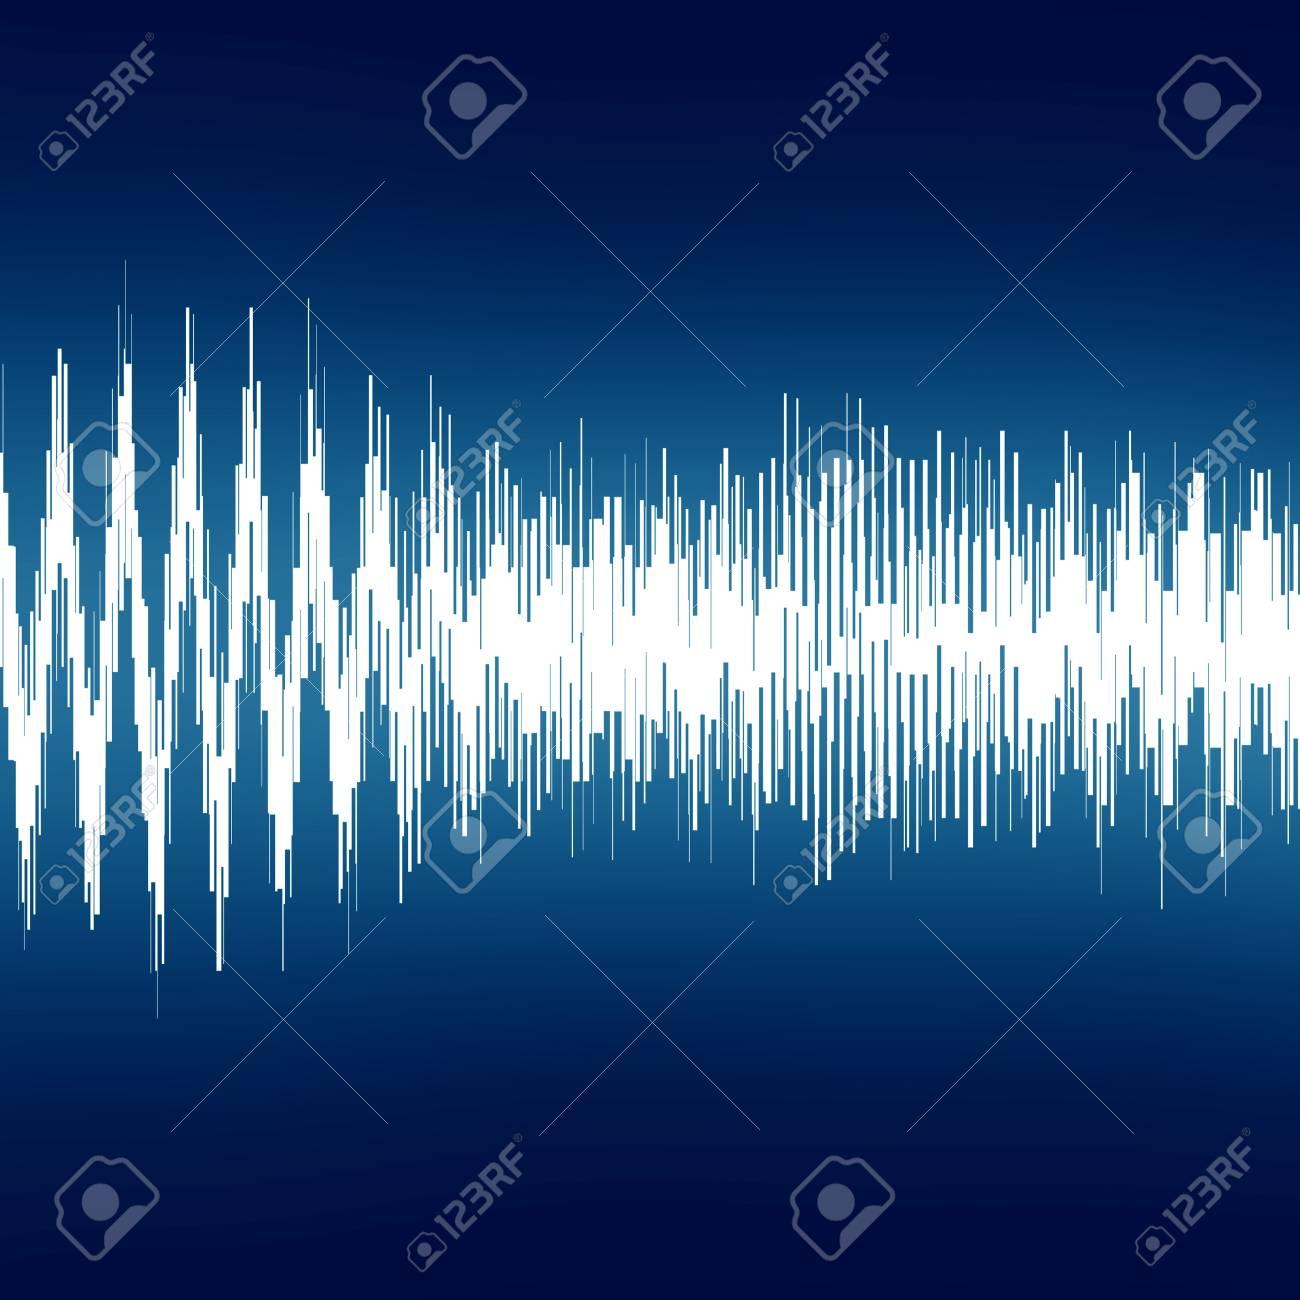 bright sound wave on a dark blue background Stock Photo - 22103516